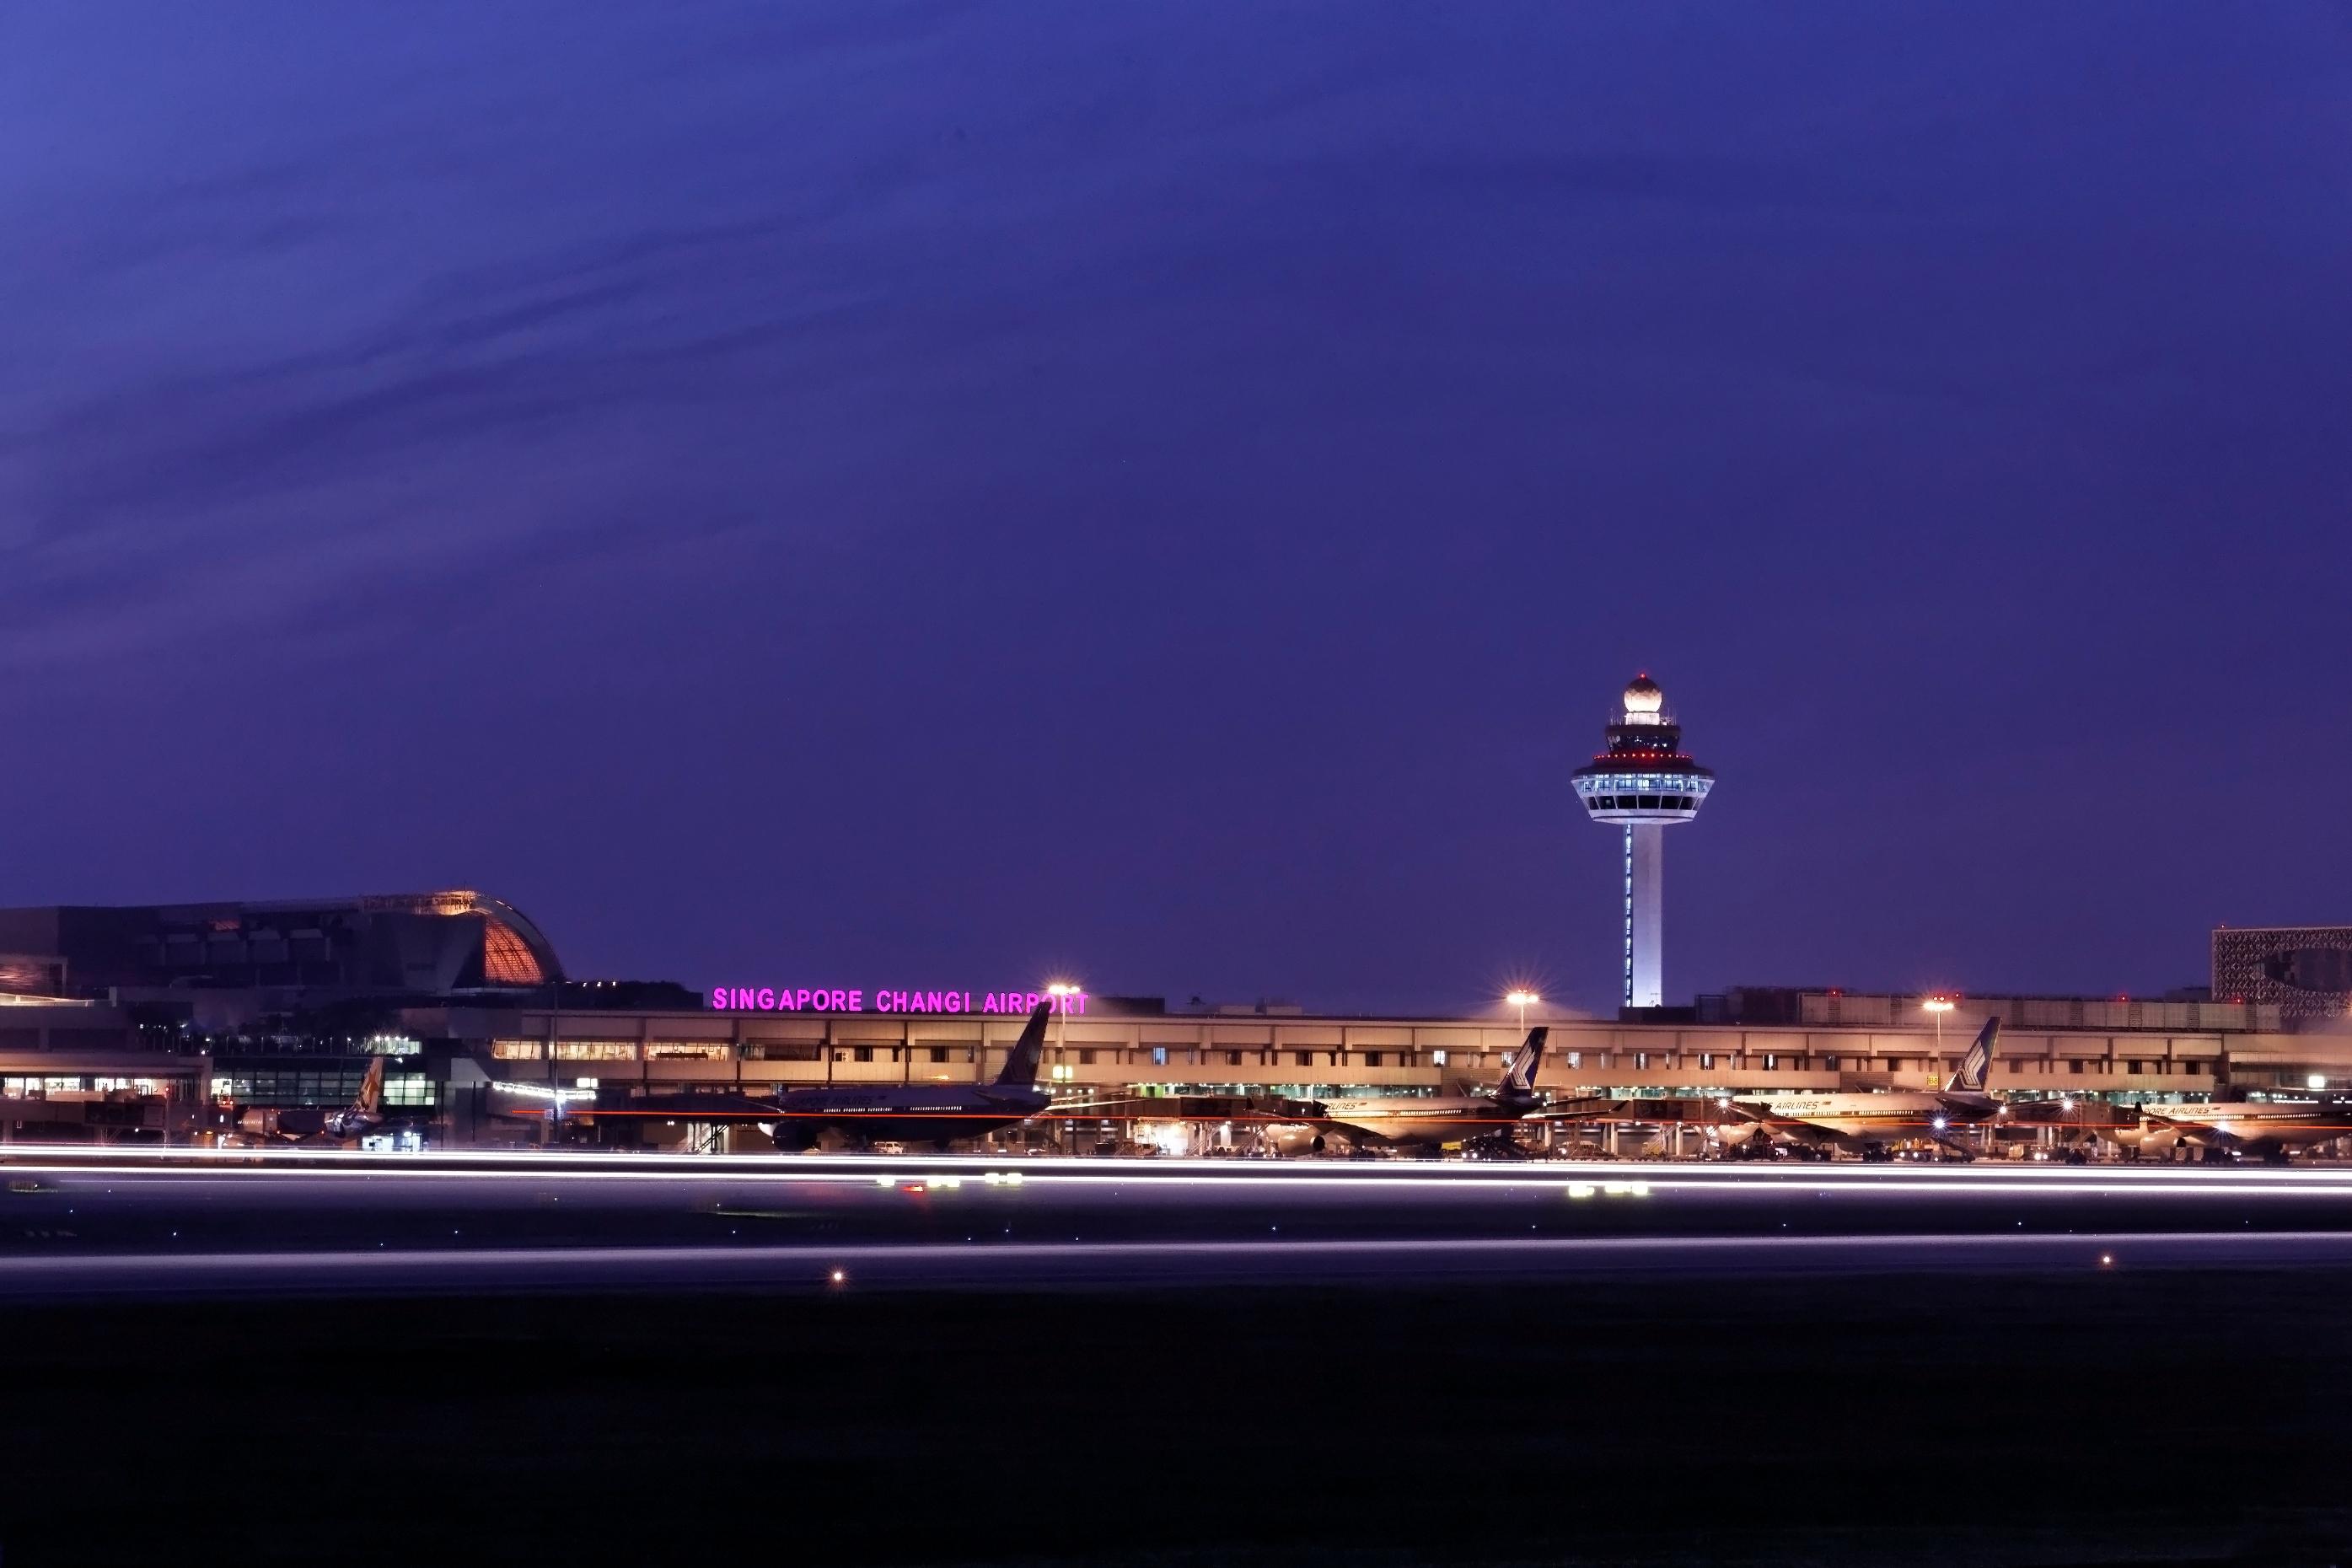 Singapore Changi Airport at night